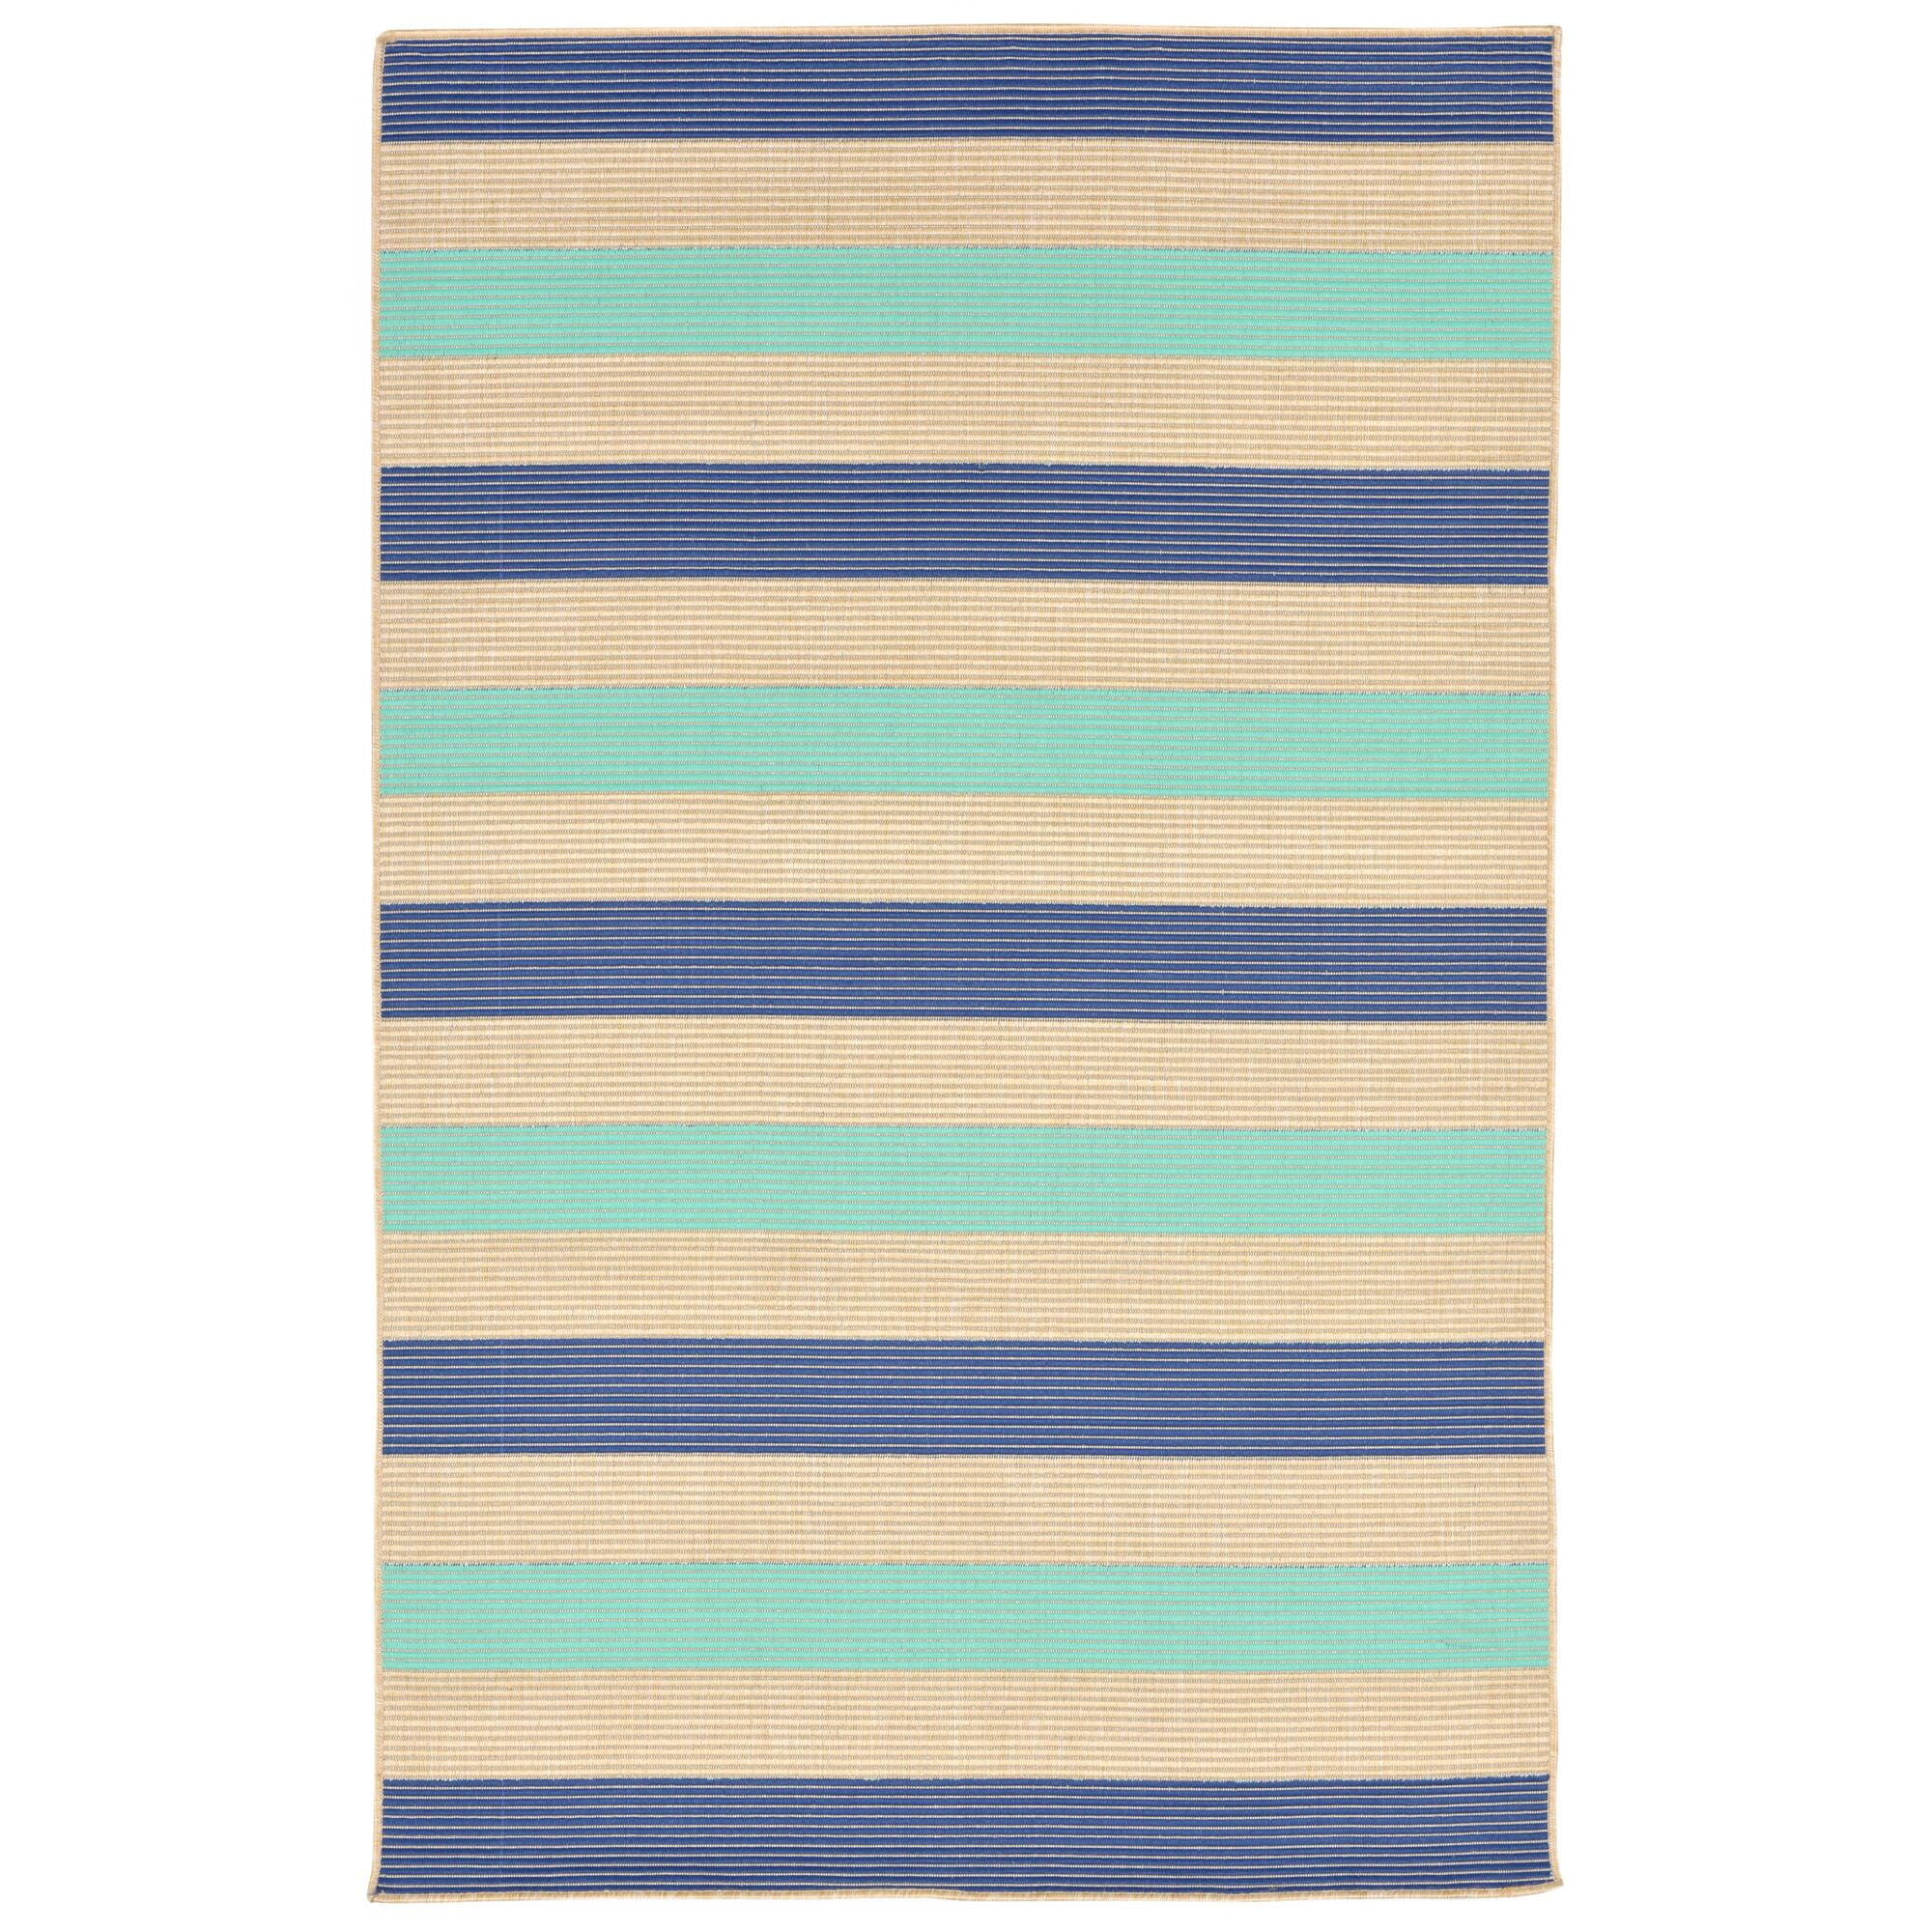 Larana Stripe Beige/Blue Synthetic Indoor/Outdoor Area Rug Rug Size: Rectangle 7'10